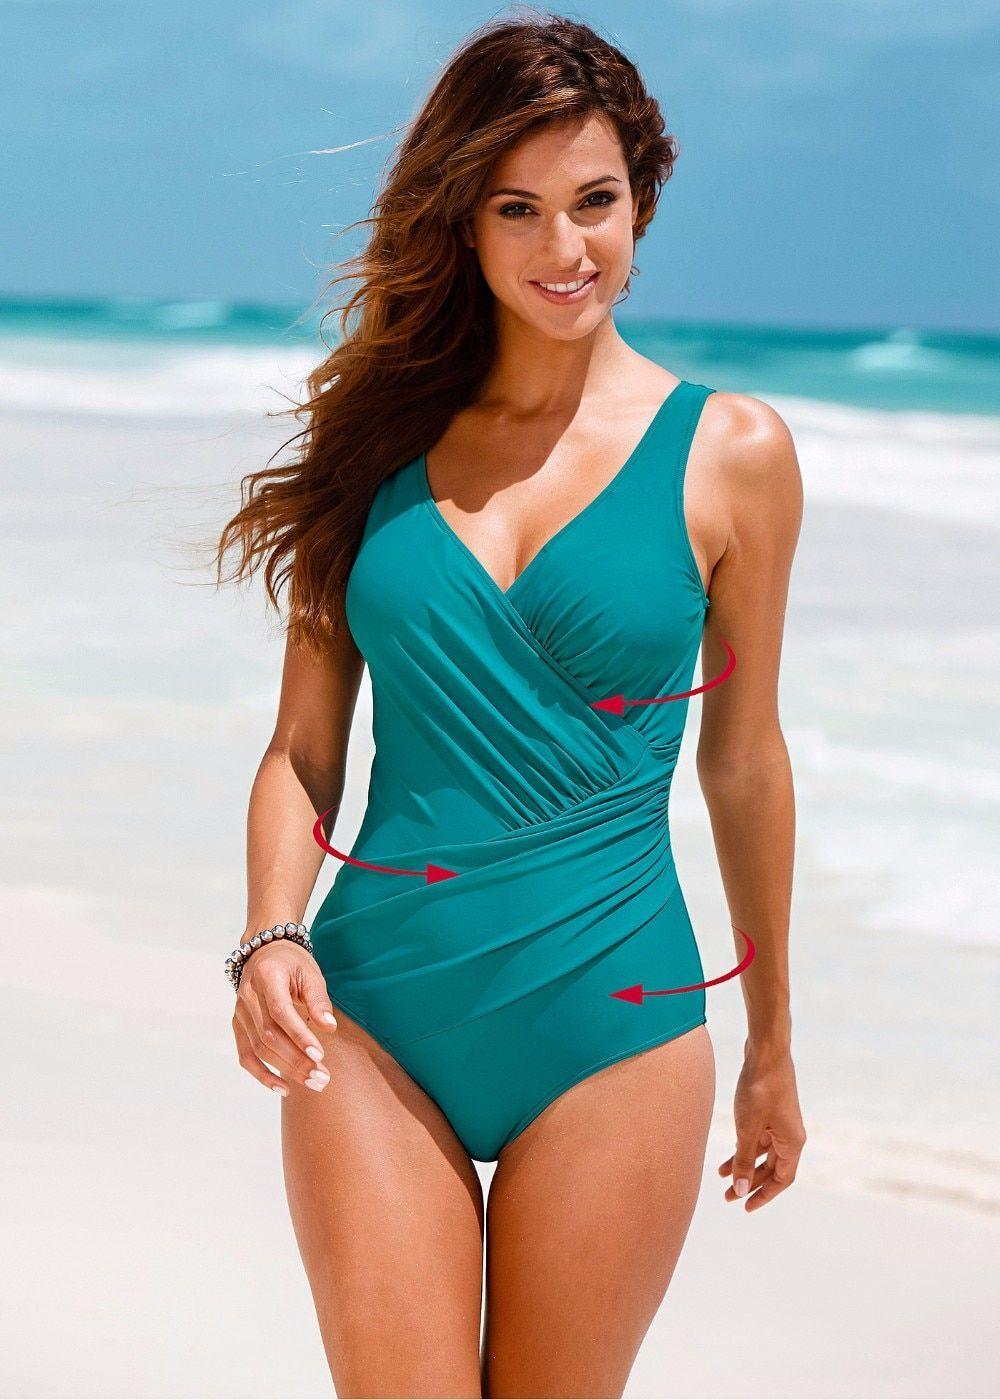 765d0ad330e4a  32.04 - Awesome NAKIAEOI 2017 New One Piece Swimsuit Women Plus Size  Swimwear Retro Vintage Bathing Suits Beachwear Print Swim Wear Monokini 4XL  - Buy it ...